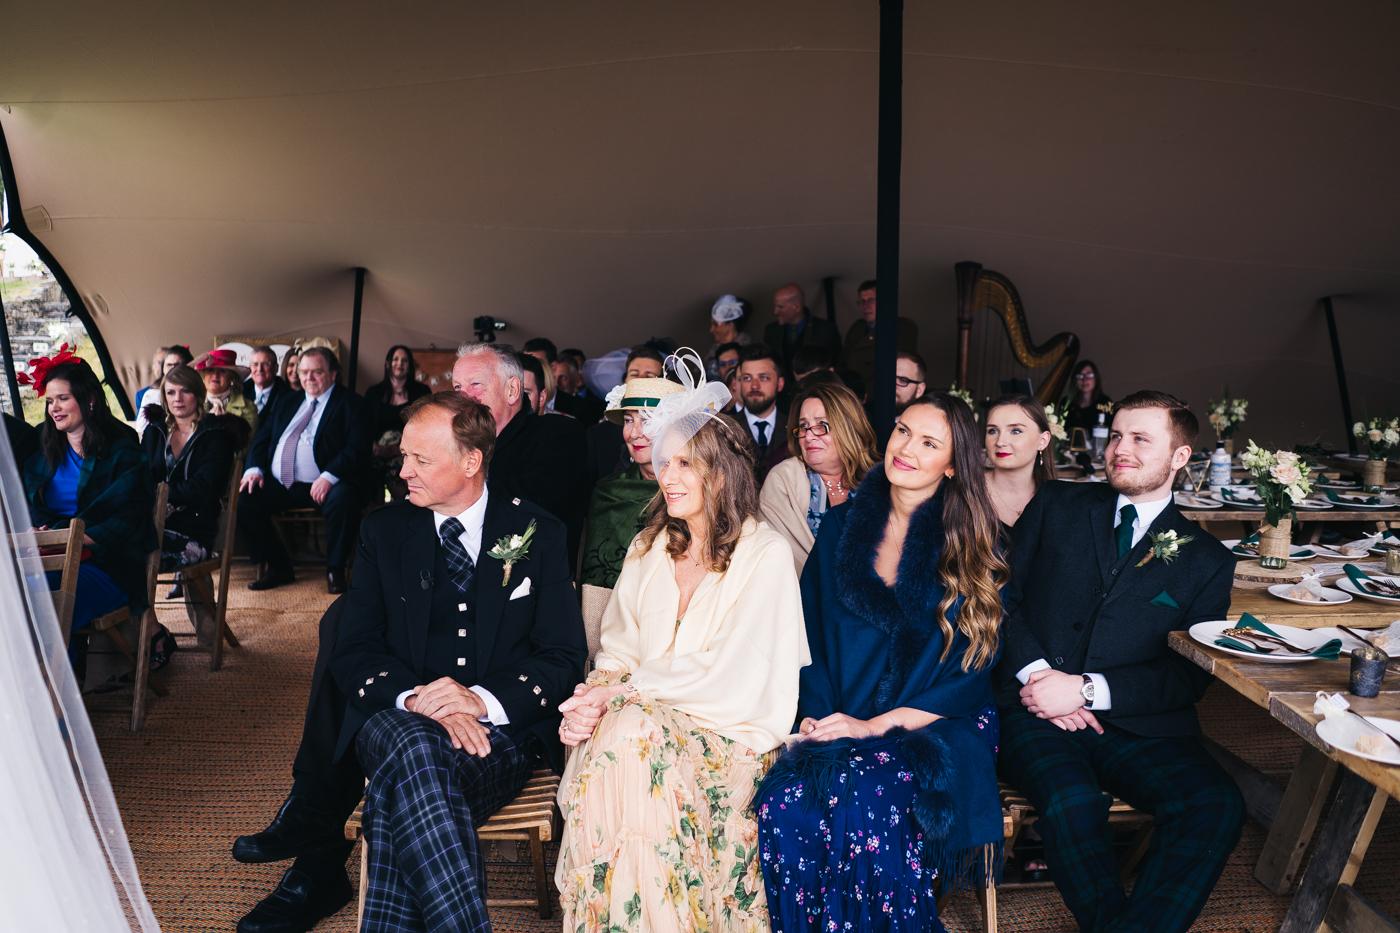 scottish-wedding-trossachs-loch-tay-highlannds-relaxed-photography-photographer-0018.jpg